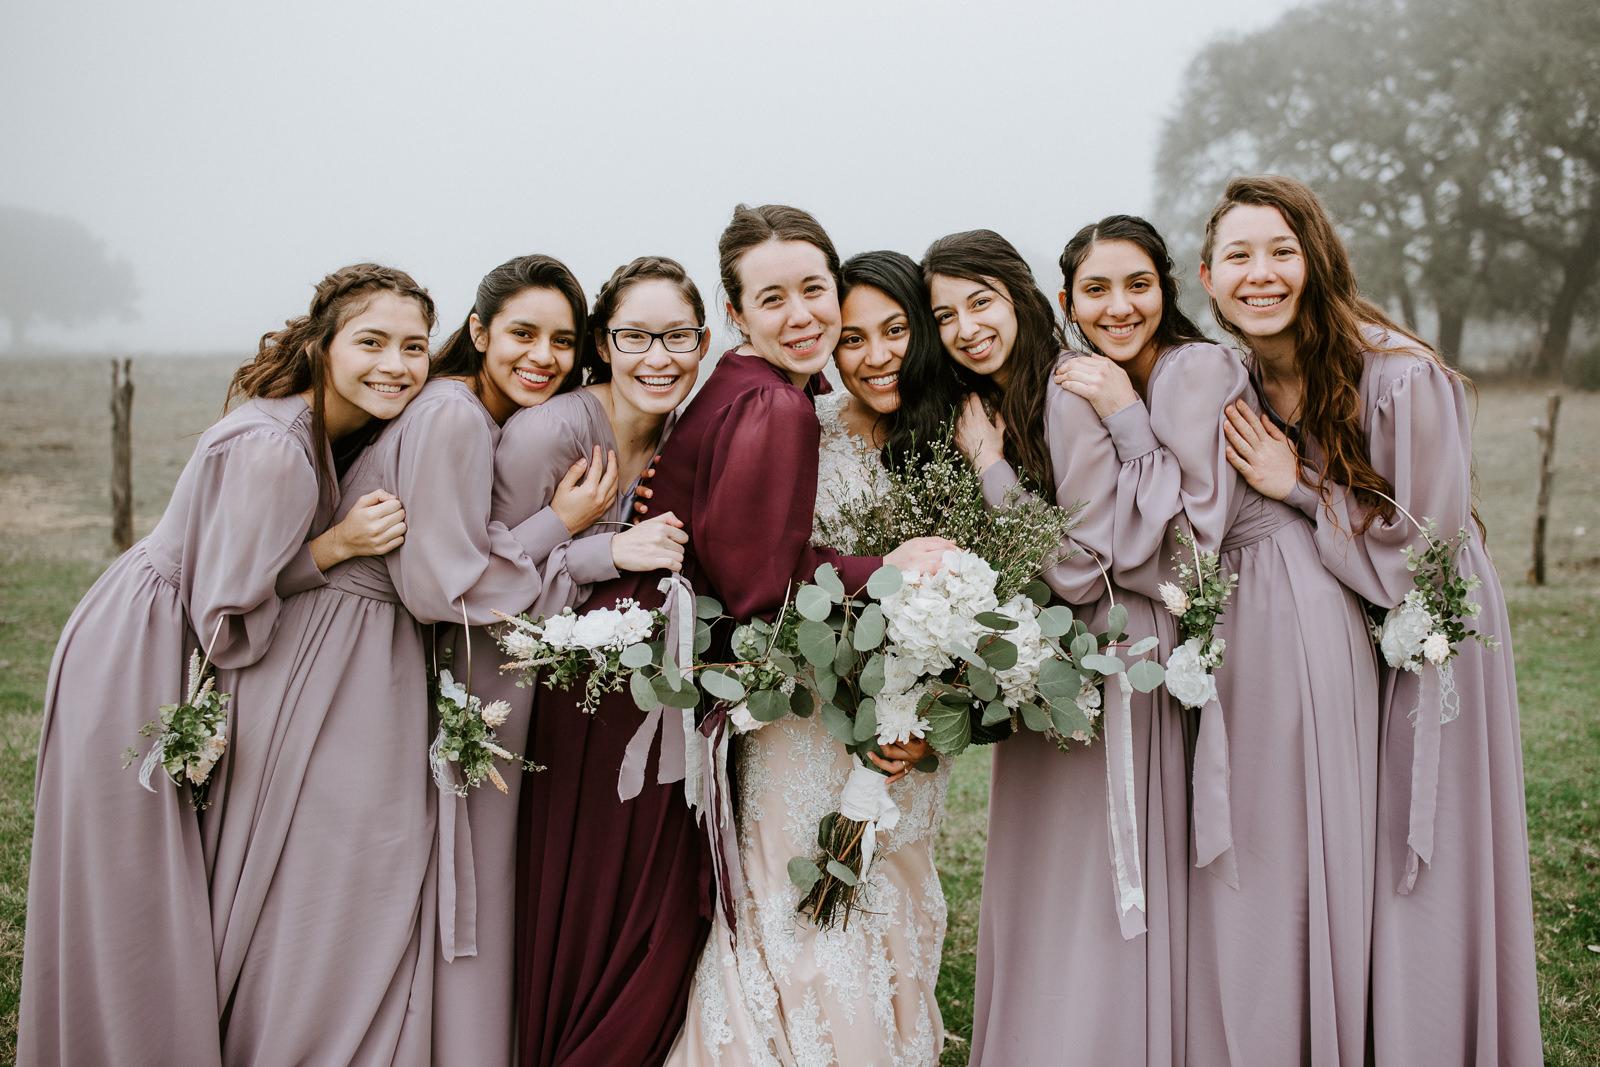 bride and bridesmaids formal portrait at austin wedding